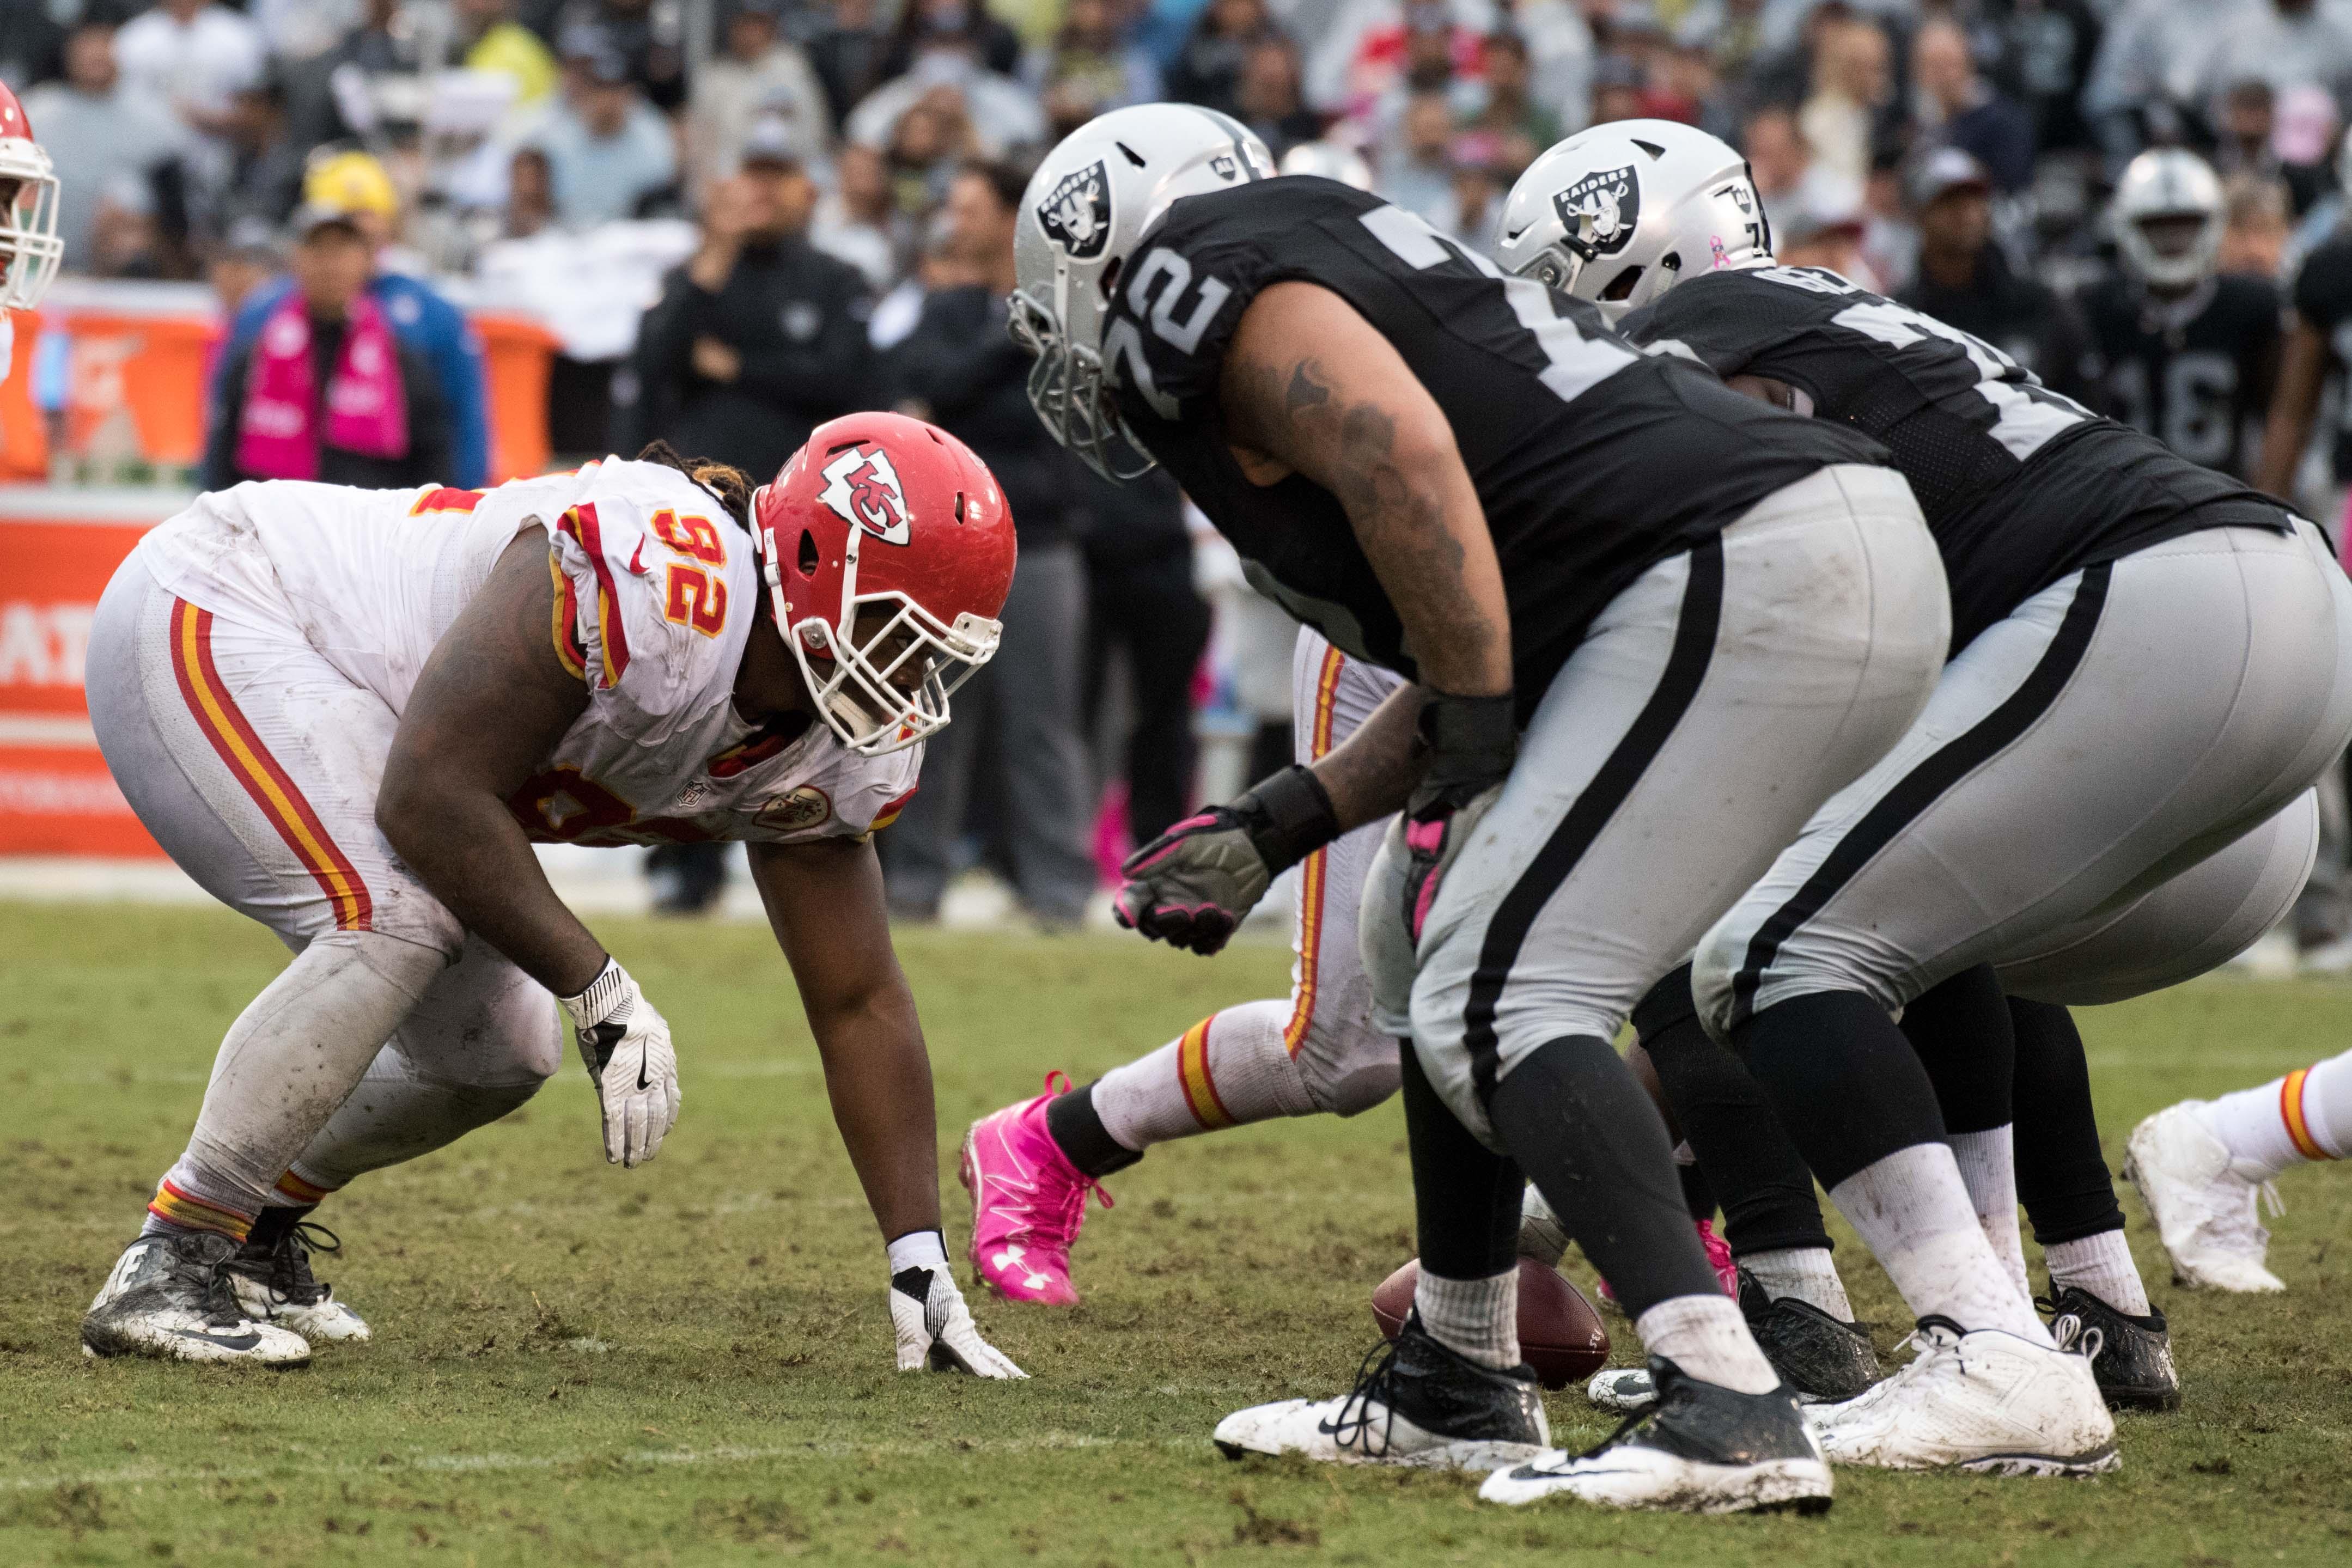 NFL: Kansas City Chiefs at Oakland Raiders